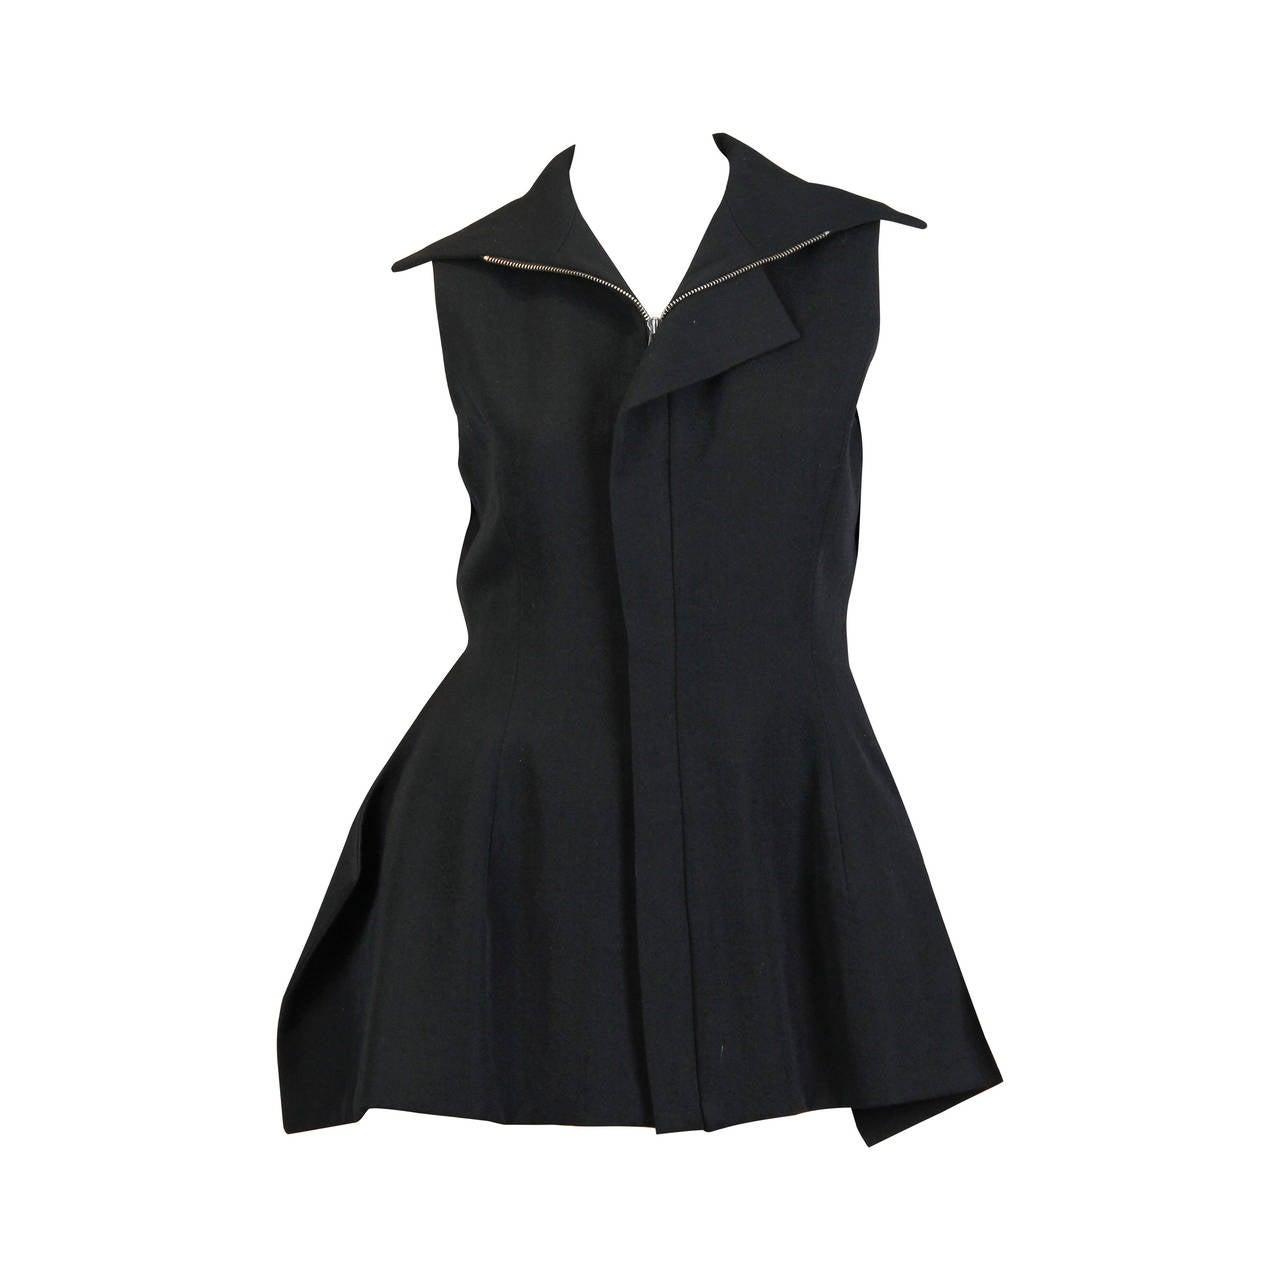 Yohji Yamamoto Backless Deconstructed Vest